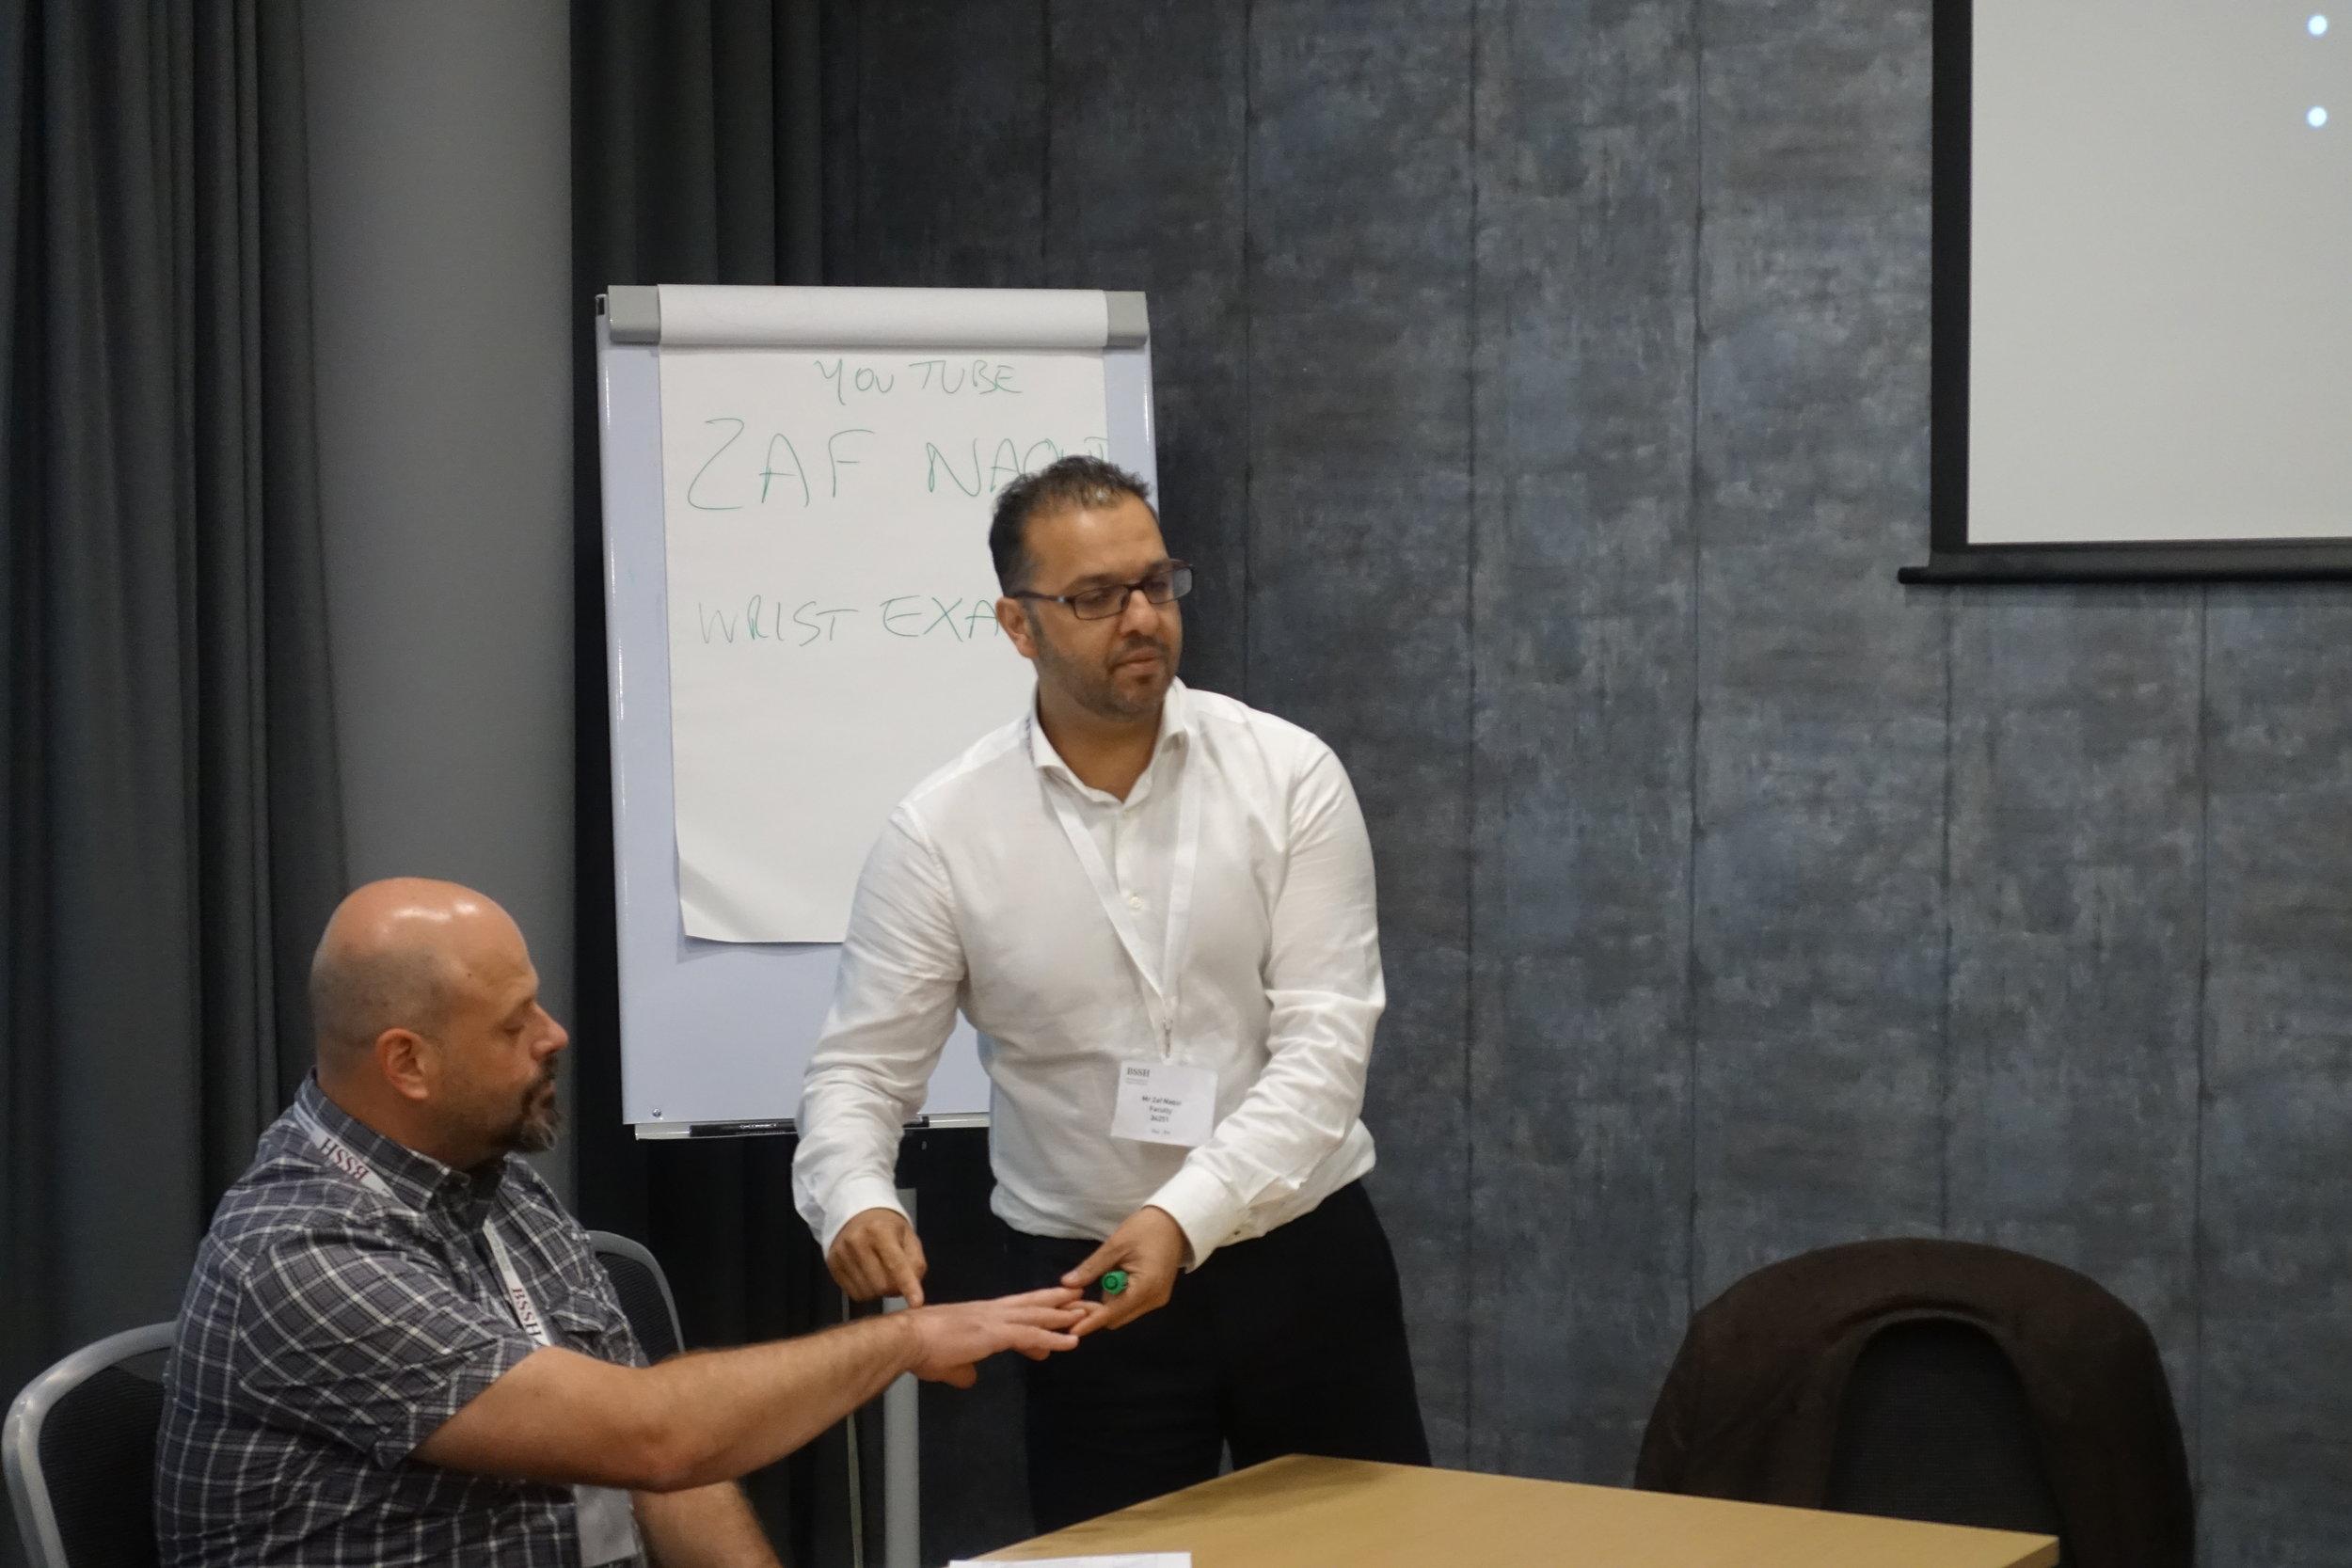 Mr Naqui teaching wrist examination